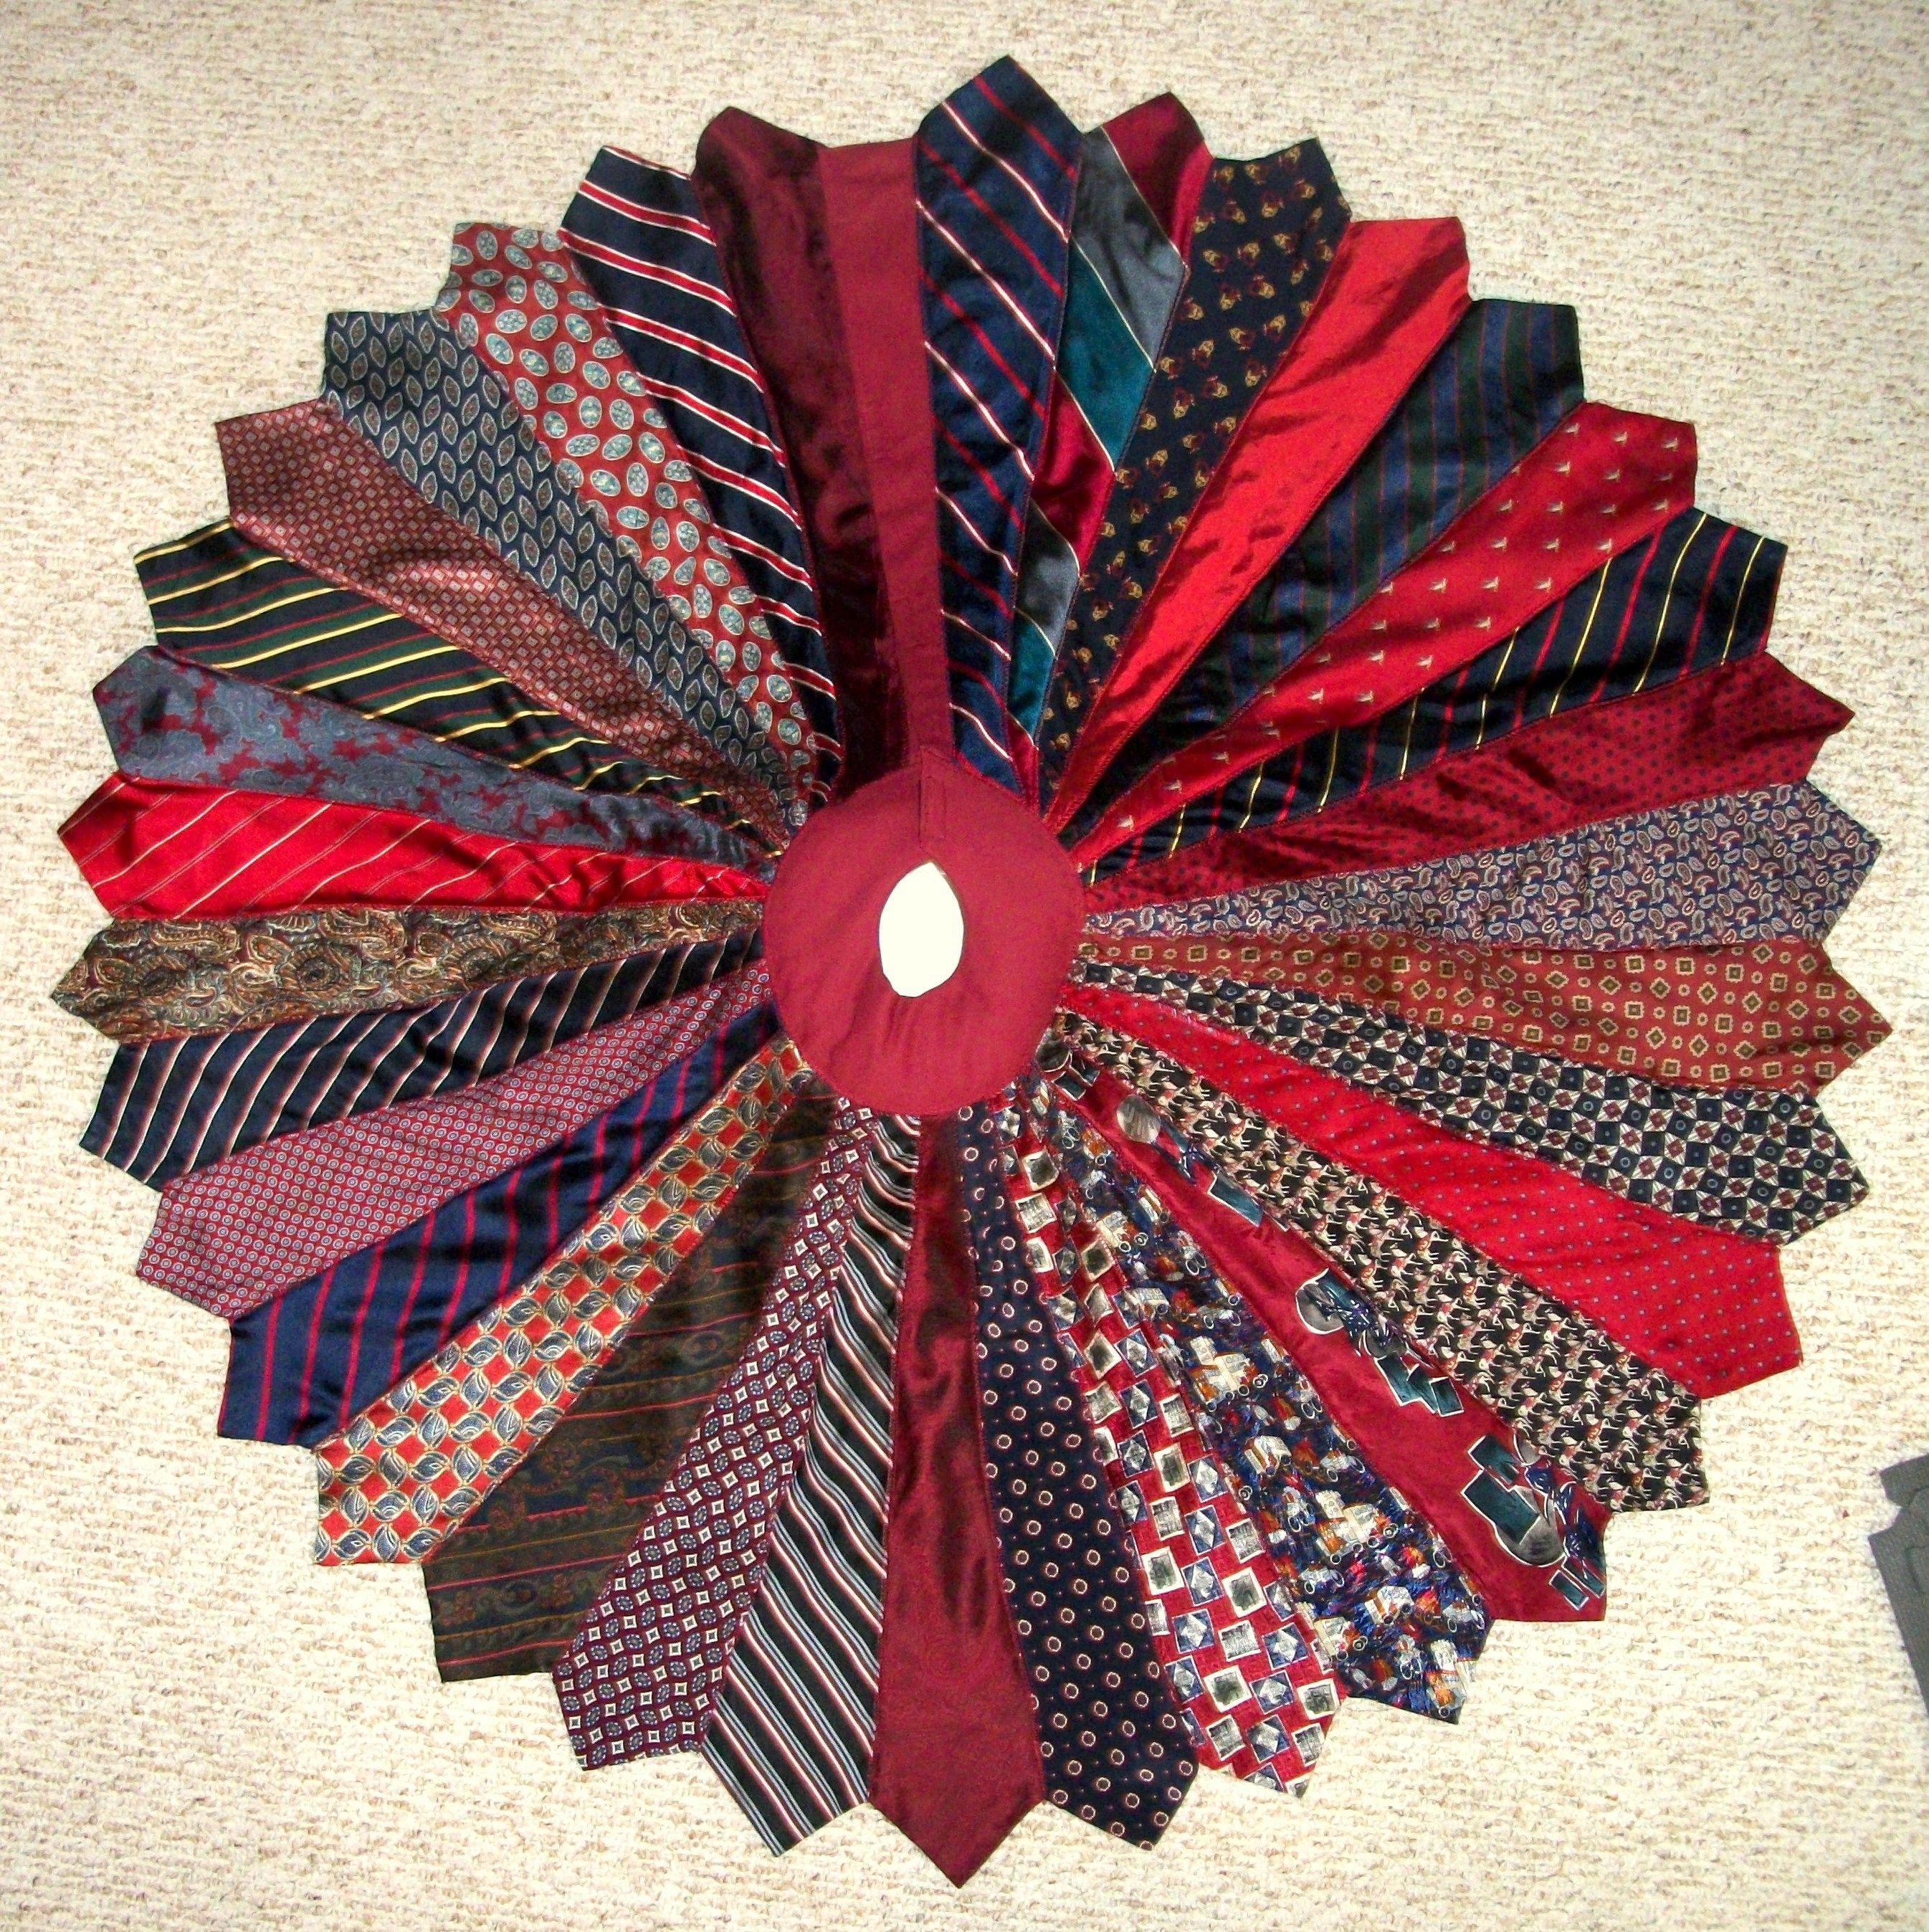 Necktie Christmas Tree Skirt ~ I made this Christmas tree skirt for ...